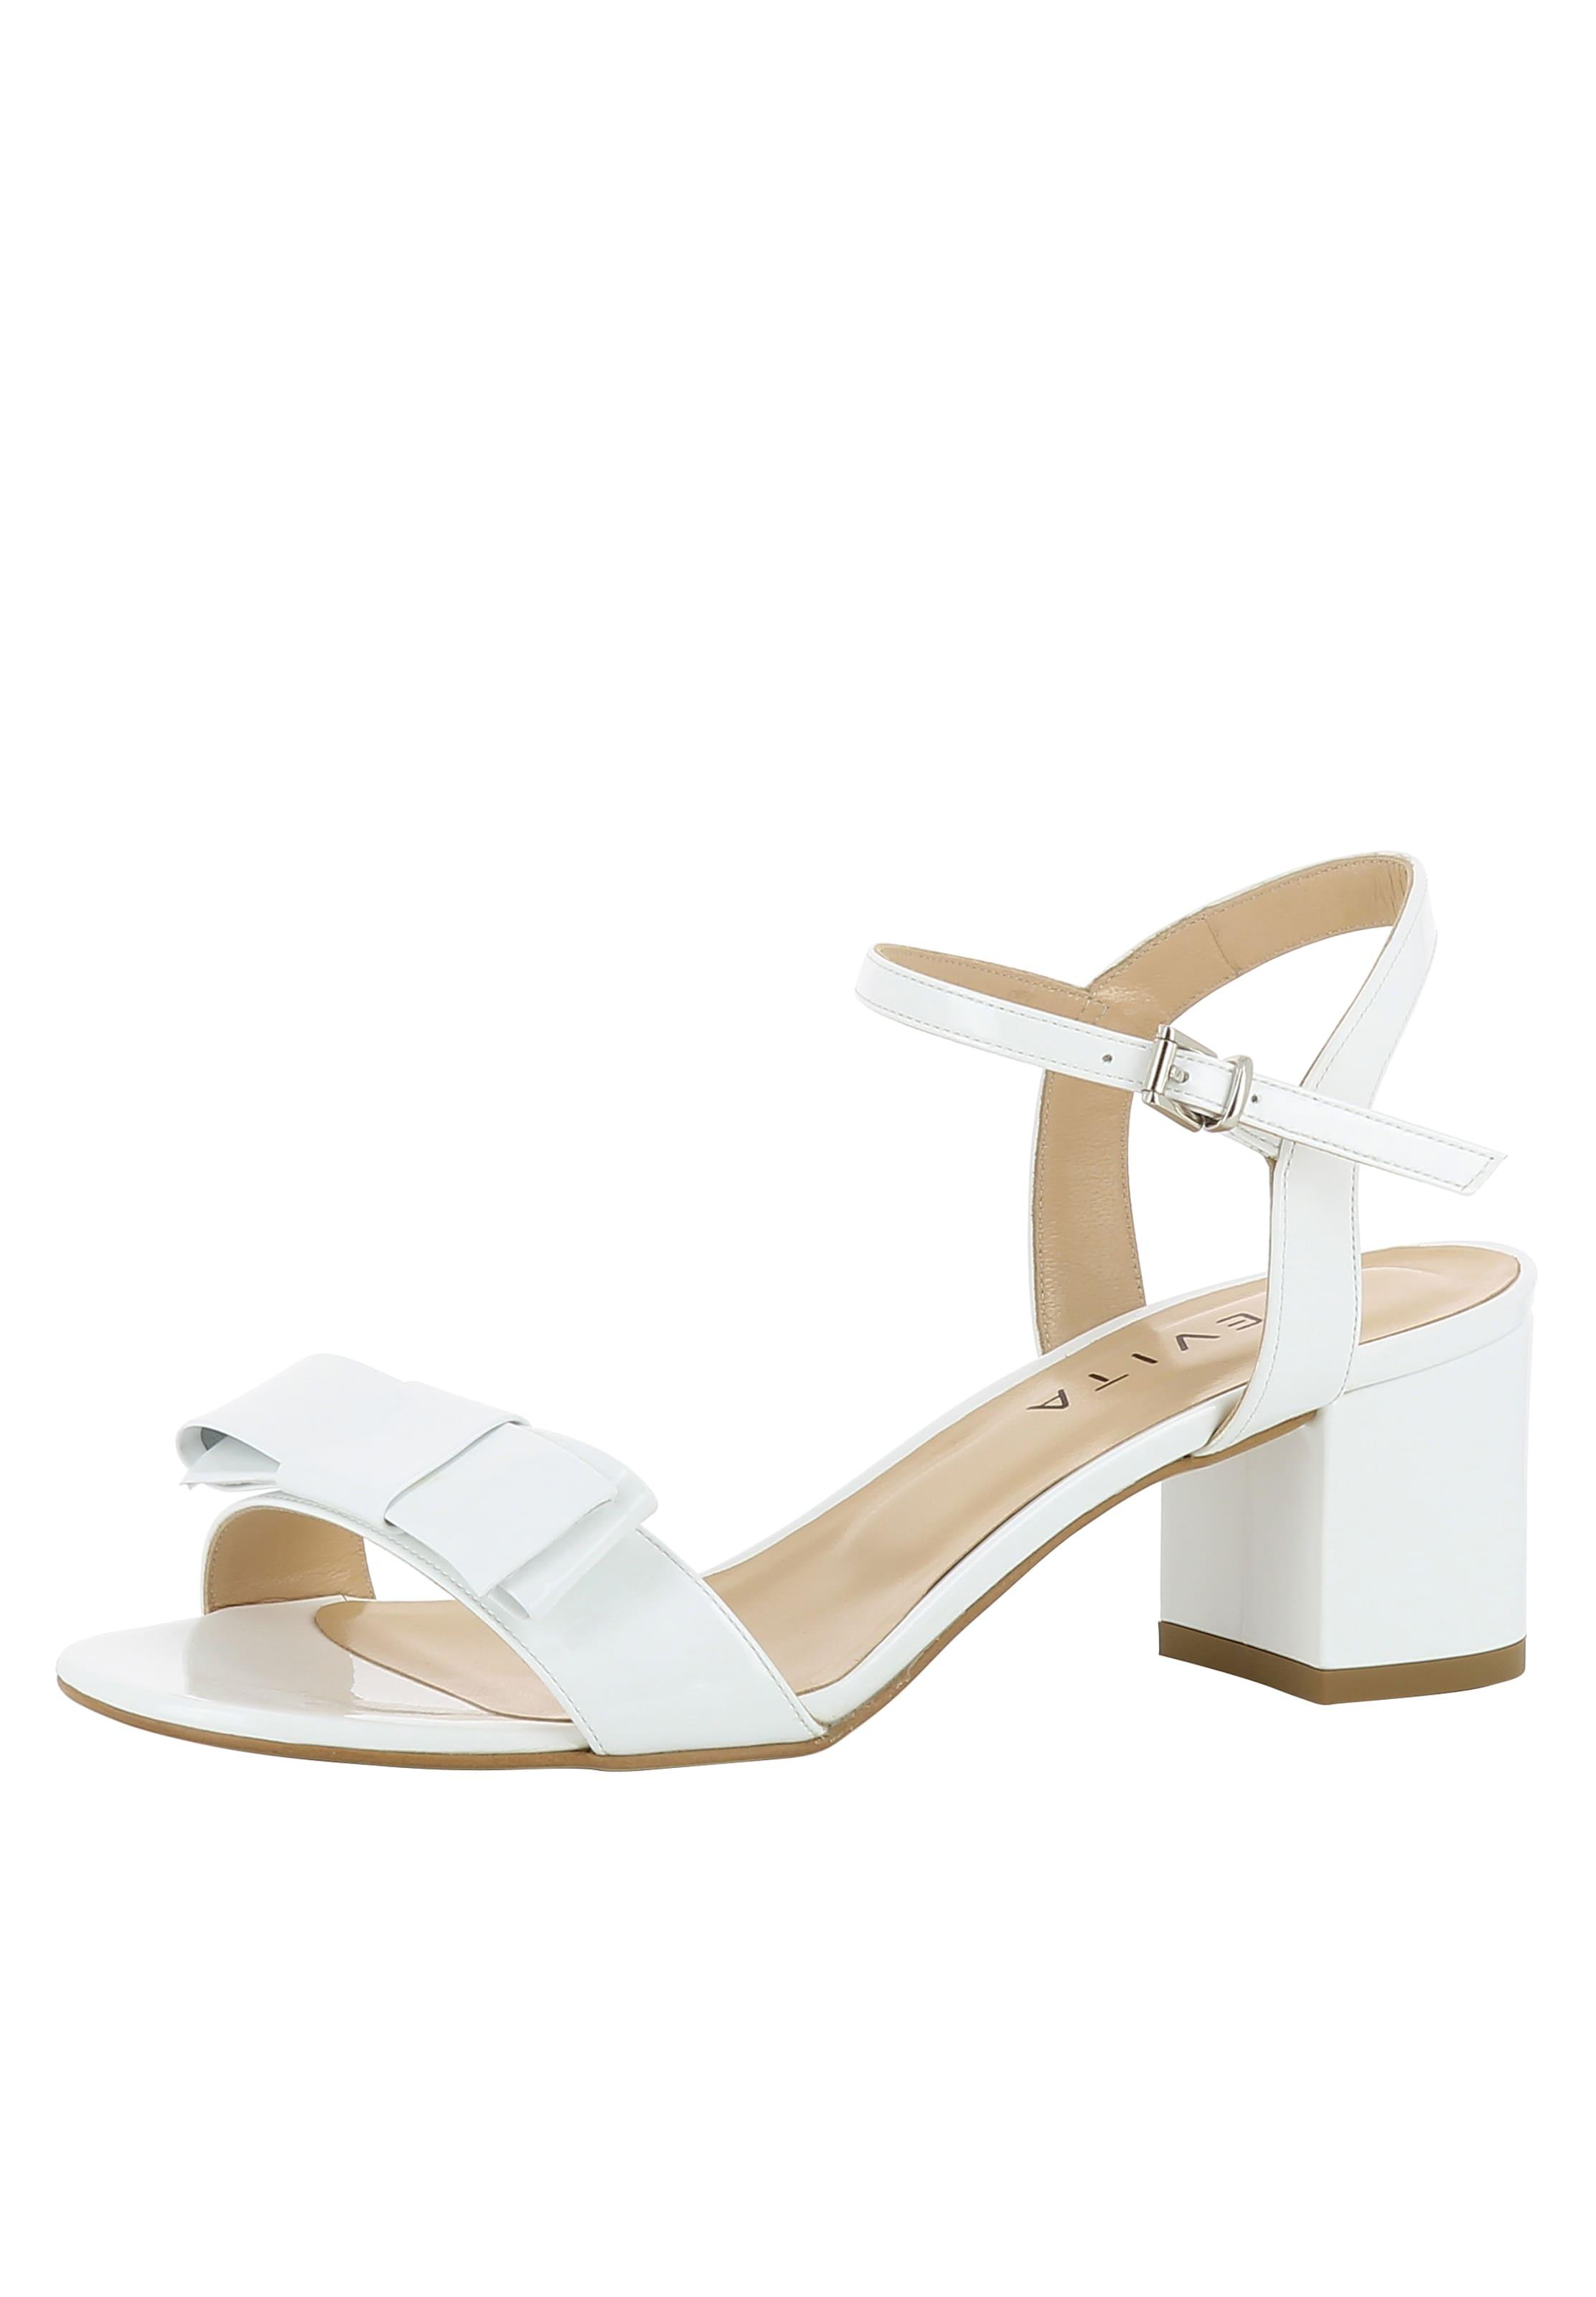 Evita À 'mariella' Sandales Blanc En Lanières jULSMGqzVp